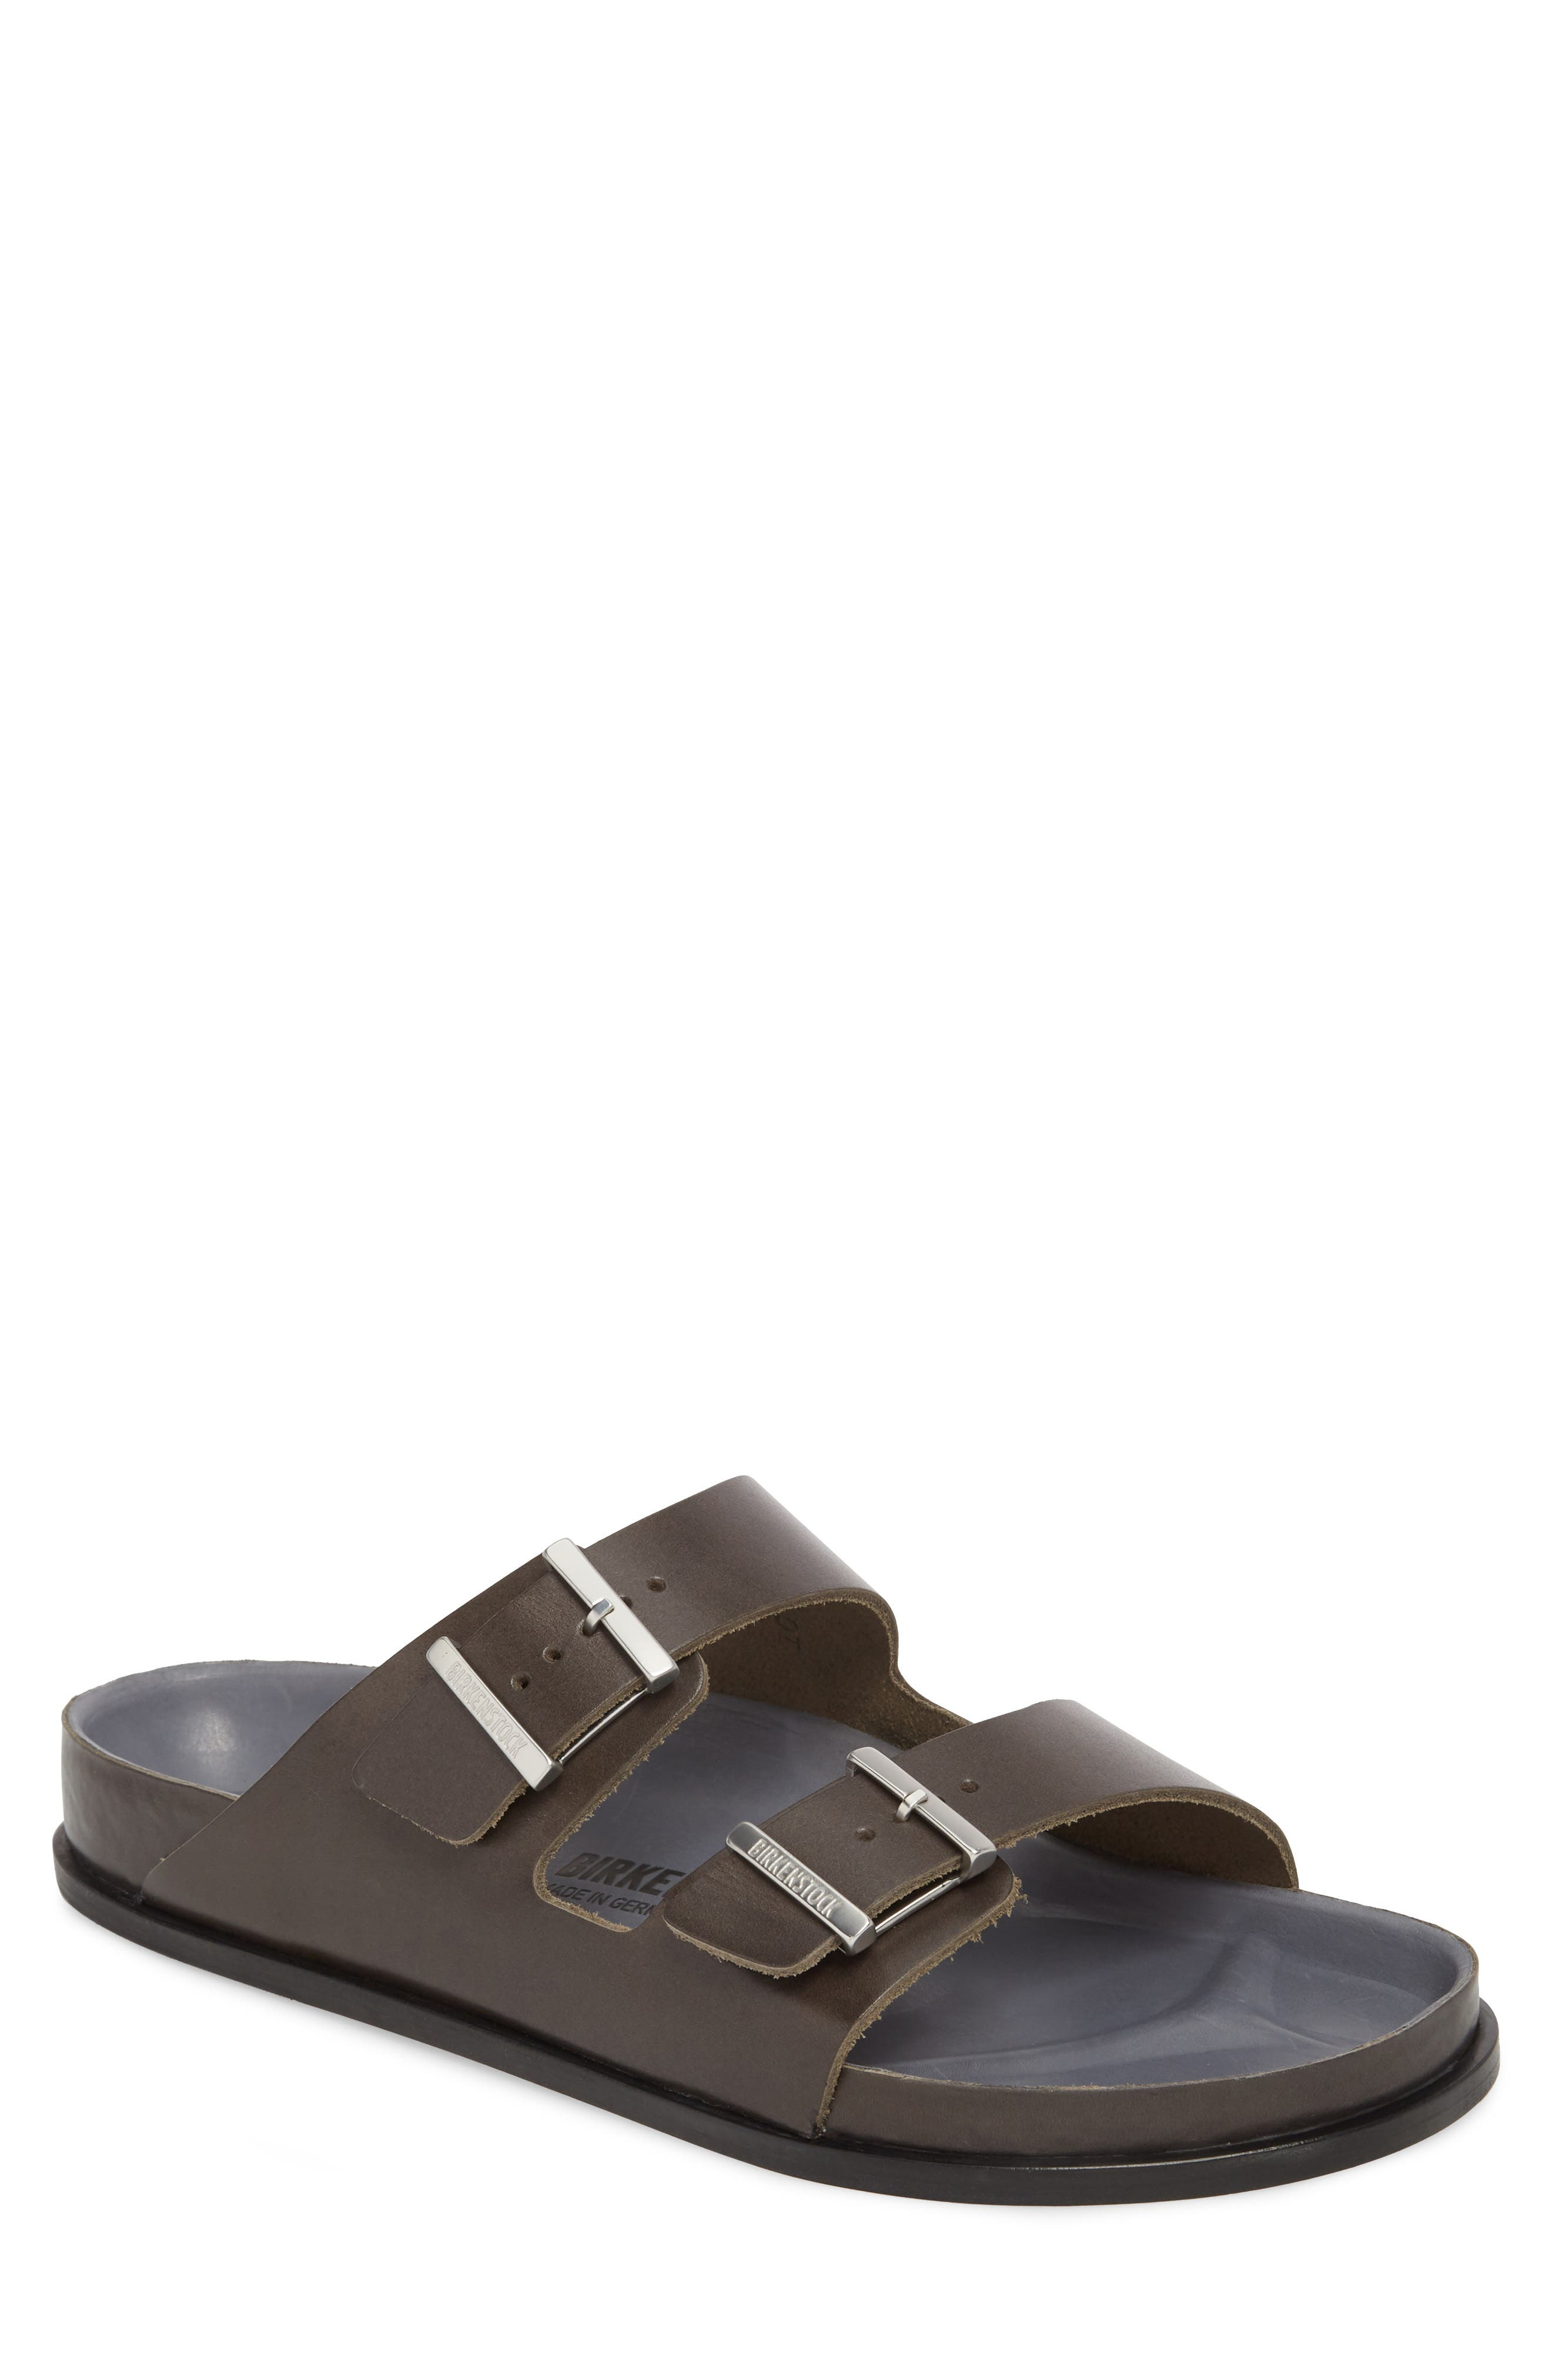 Birkenstock Arizona Premium Slide Sandal,11.5US / 44EU - Grey